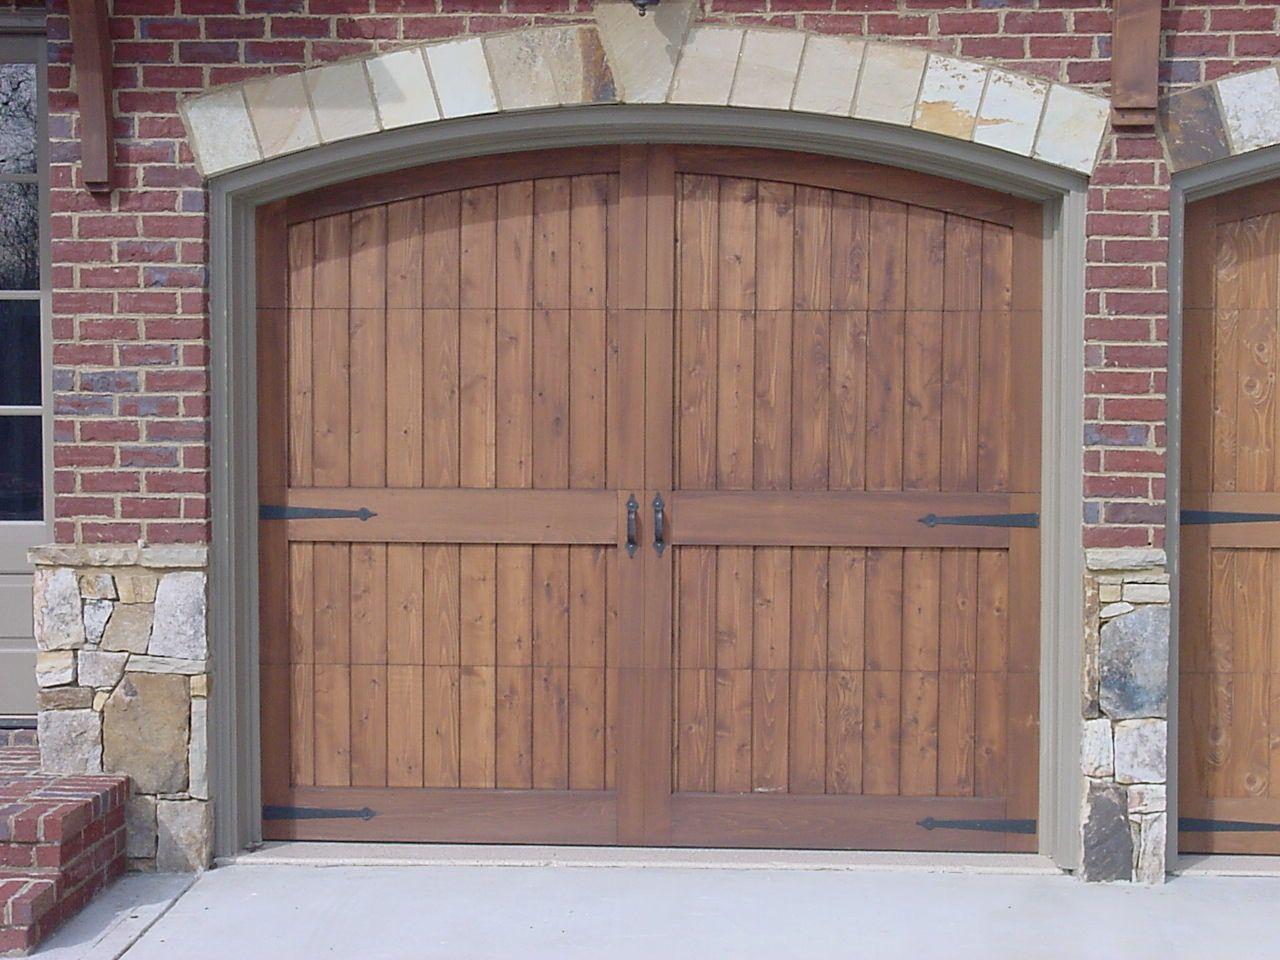 960 #7C6150 Pin By Builder Specialties On Carriage Doors Garage Doors Pinterest image Garage Doors Delaware 37431280